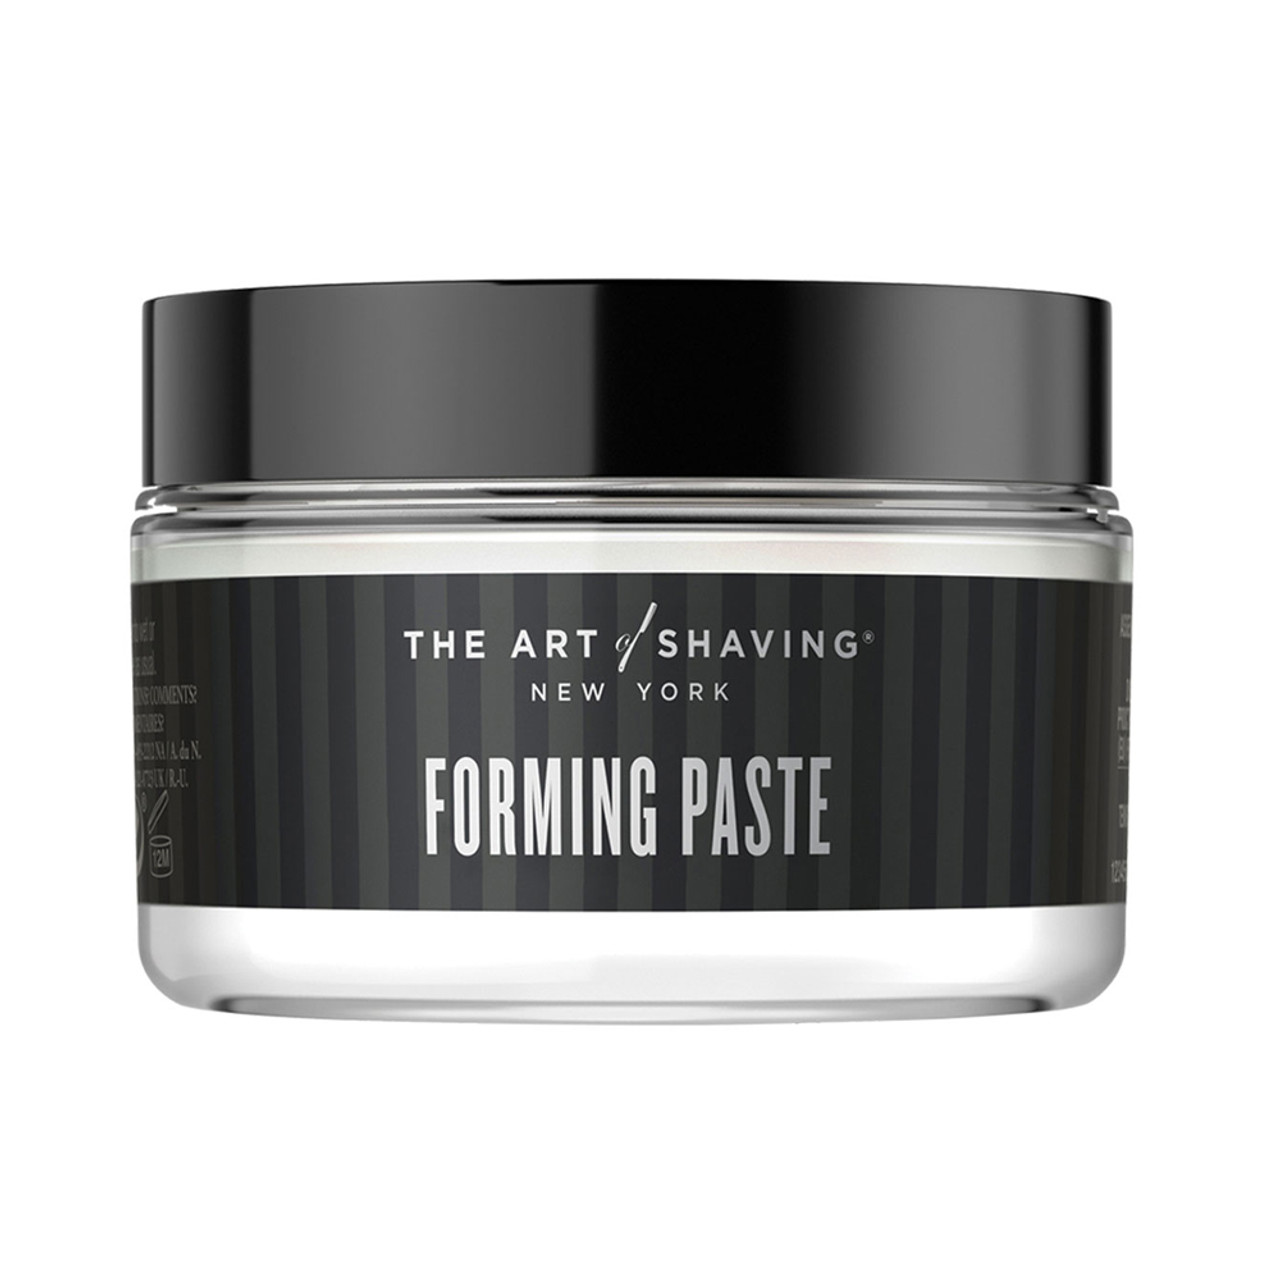 The Art Of Shaving Forming Paste